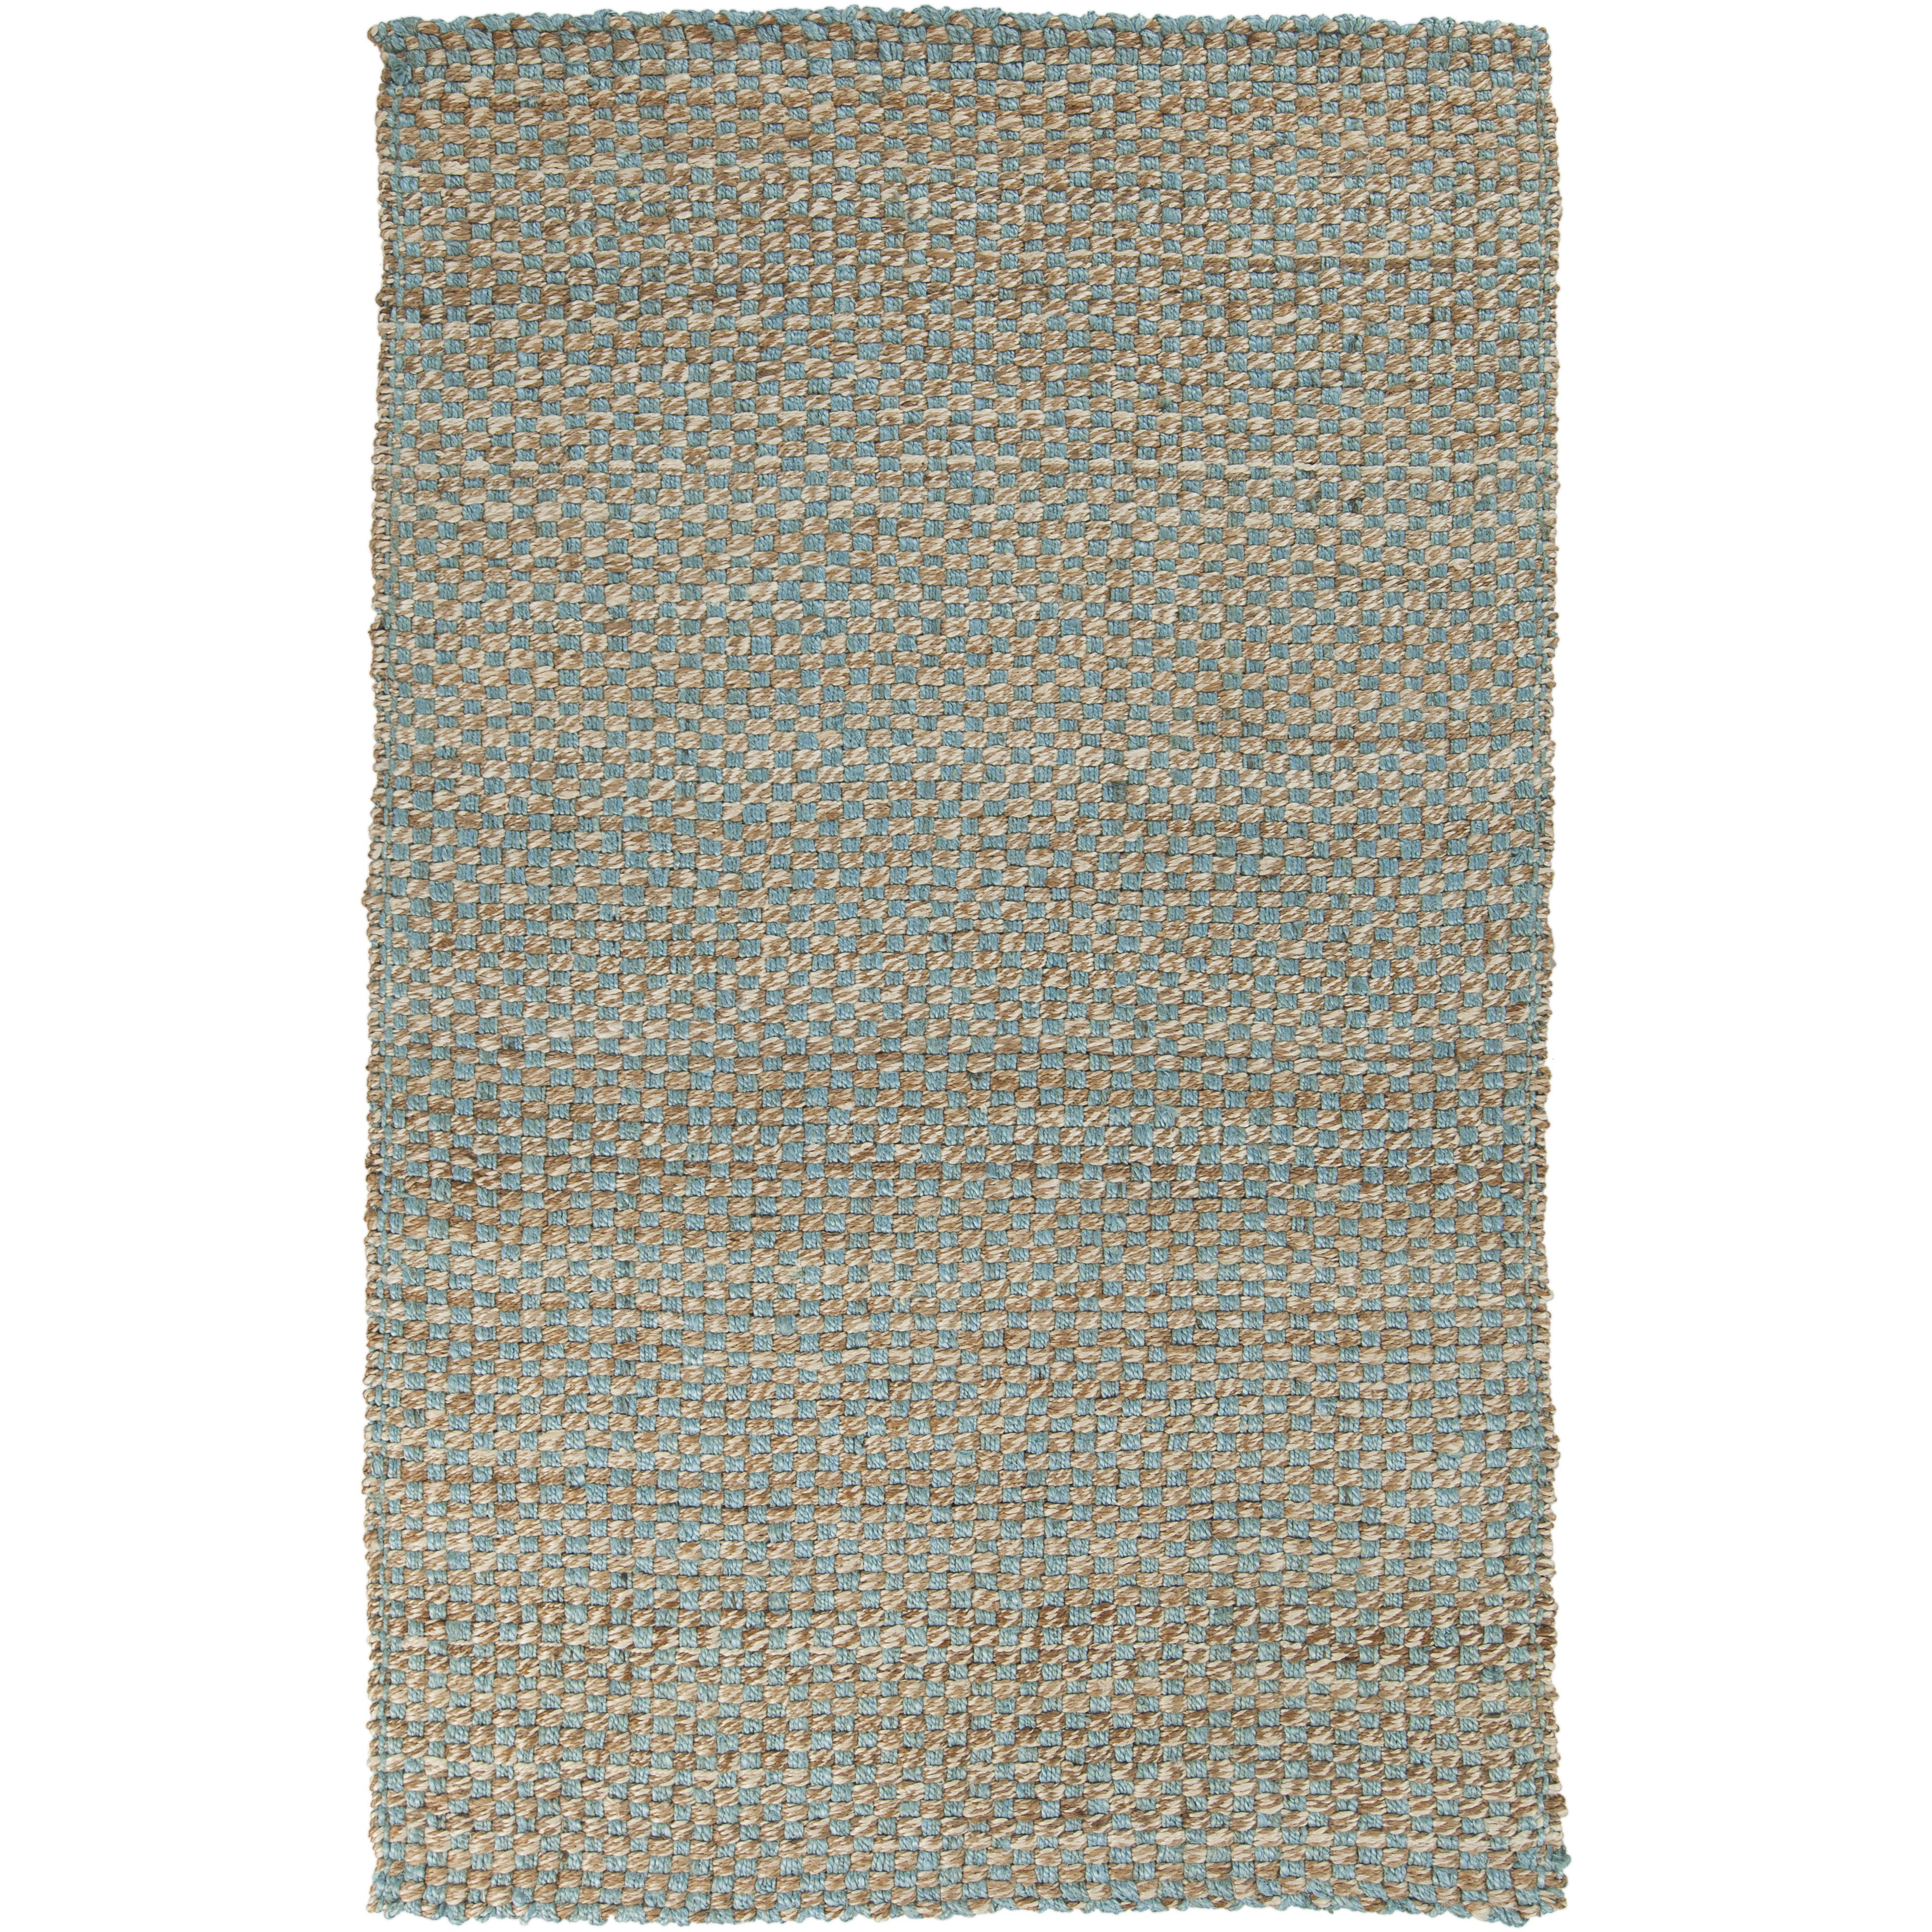 Surya Reeds 2' x 3' - Item Number: REED823-23